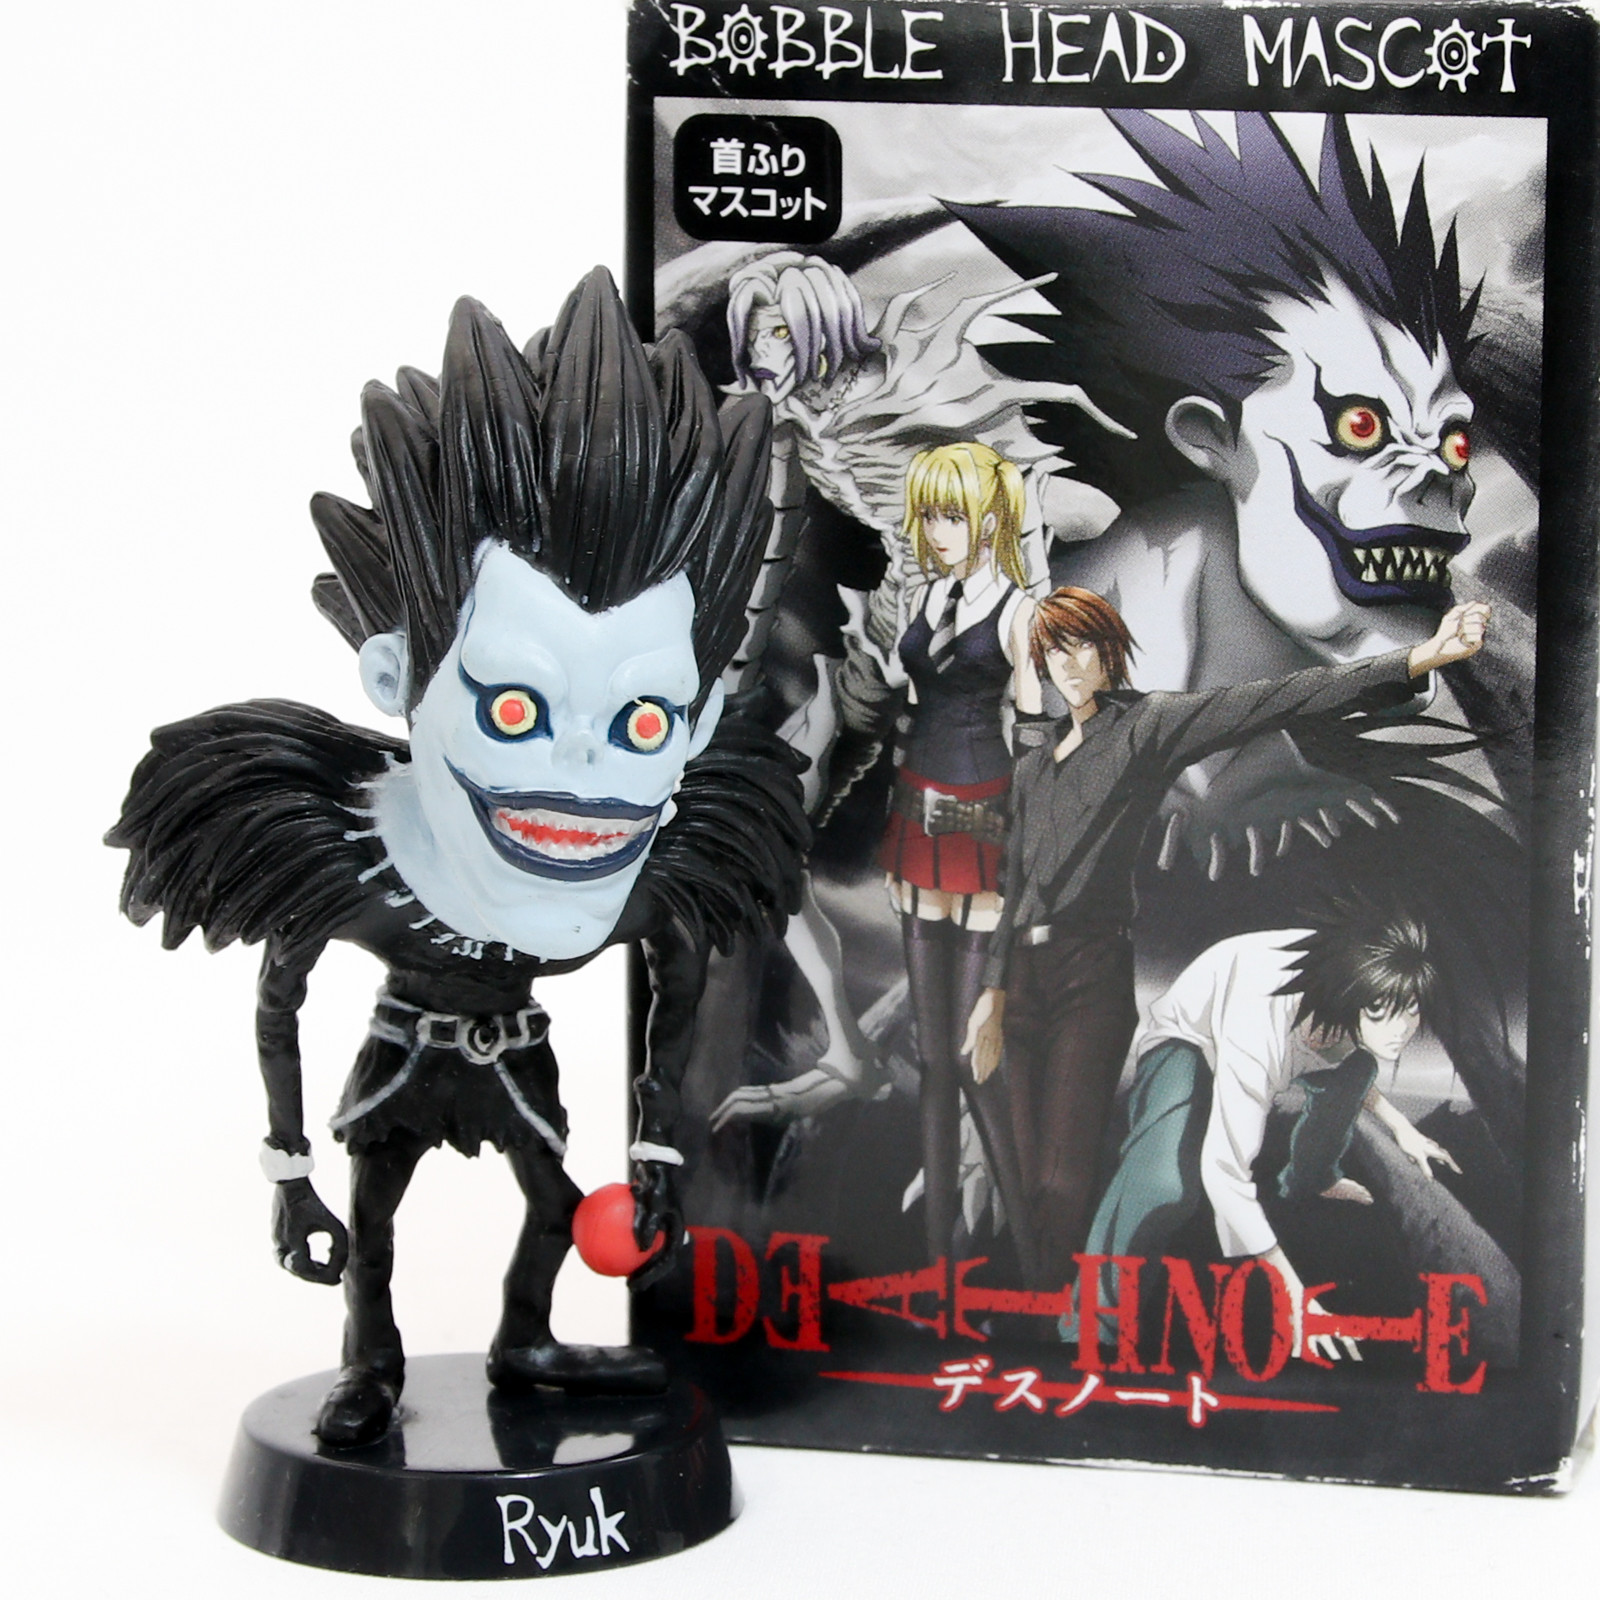 Death Note Ryuk Bobble Bobbin Head Figure JAPAN ANIME MANGA